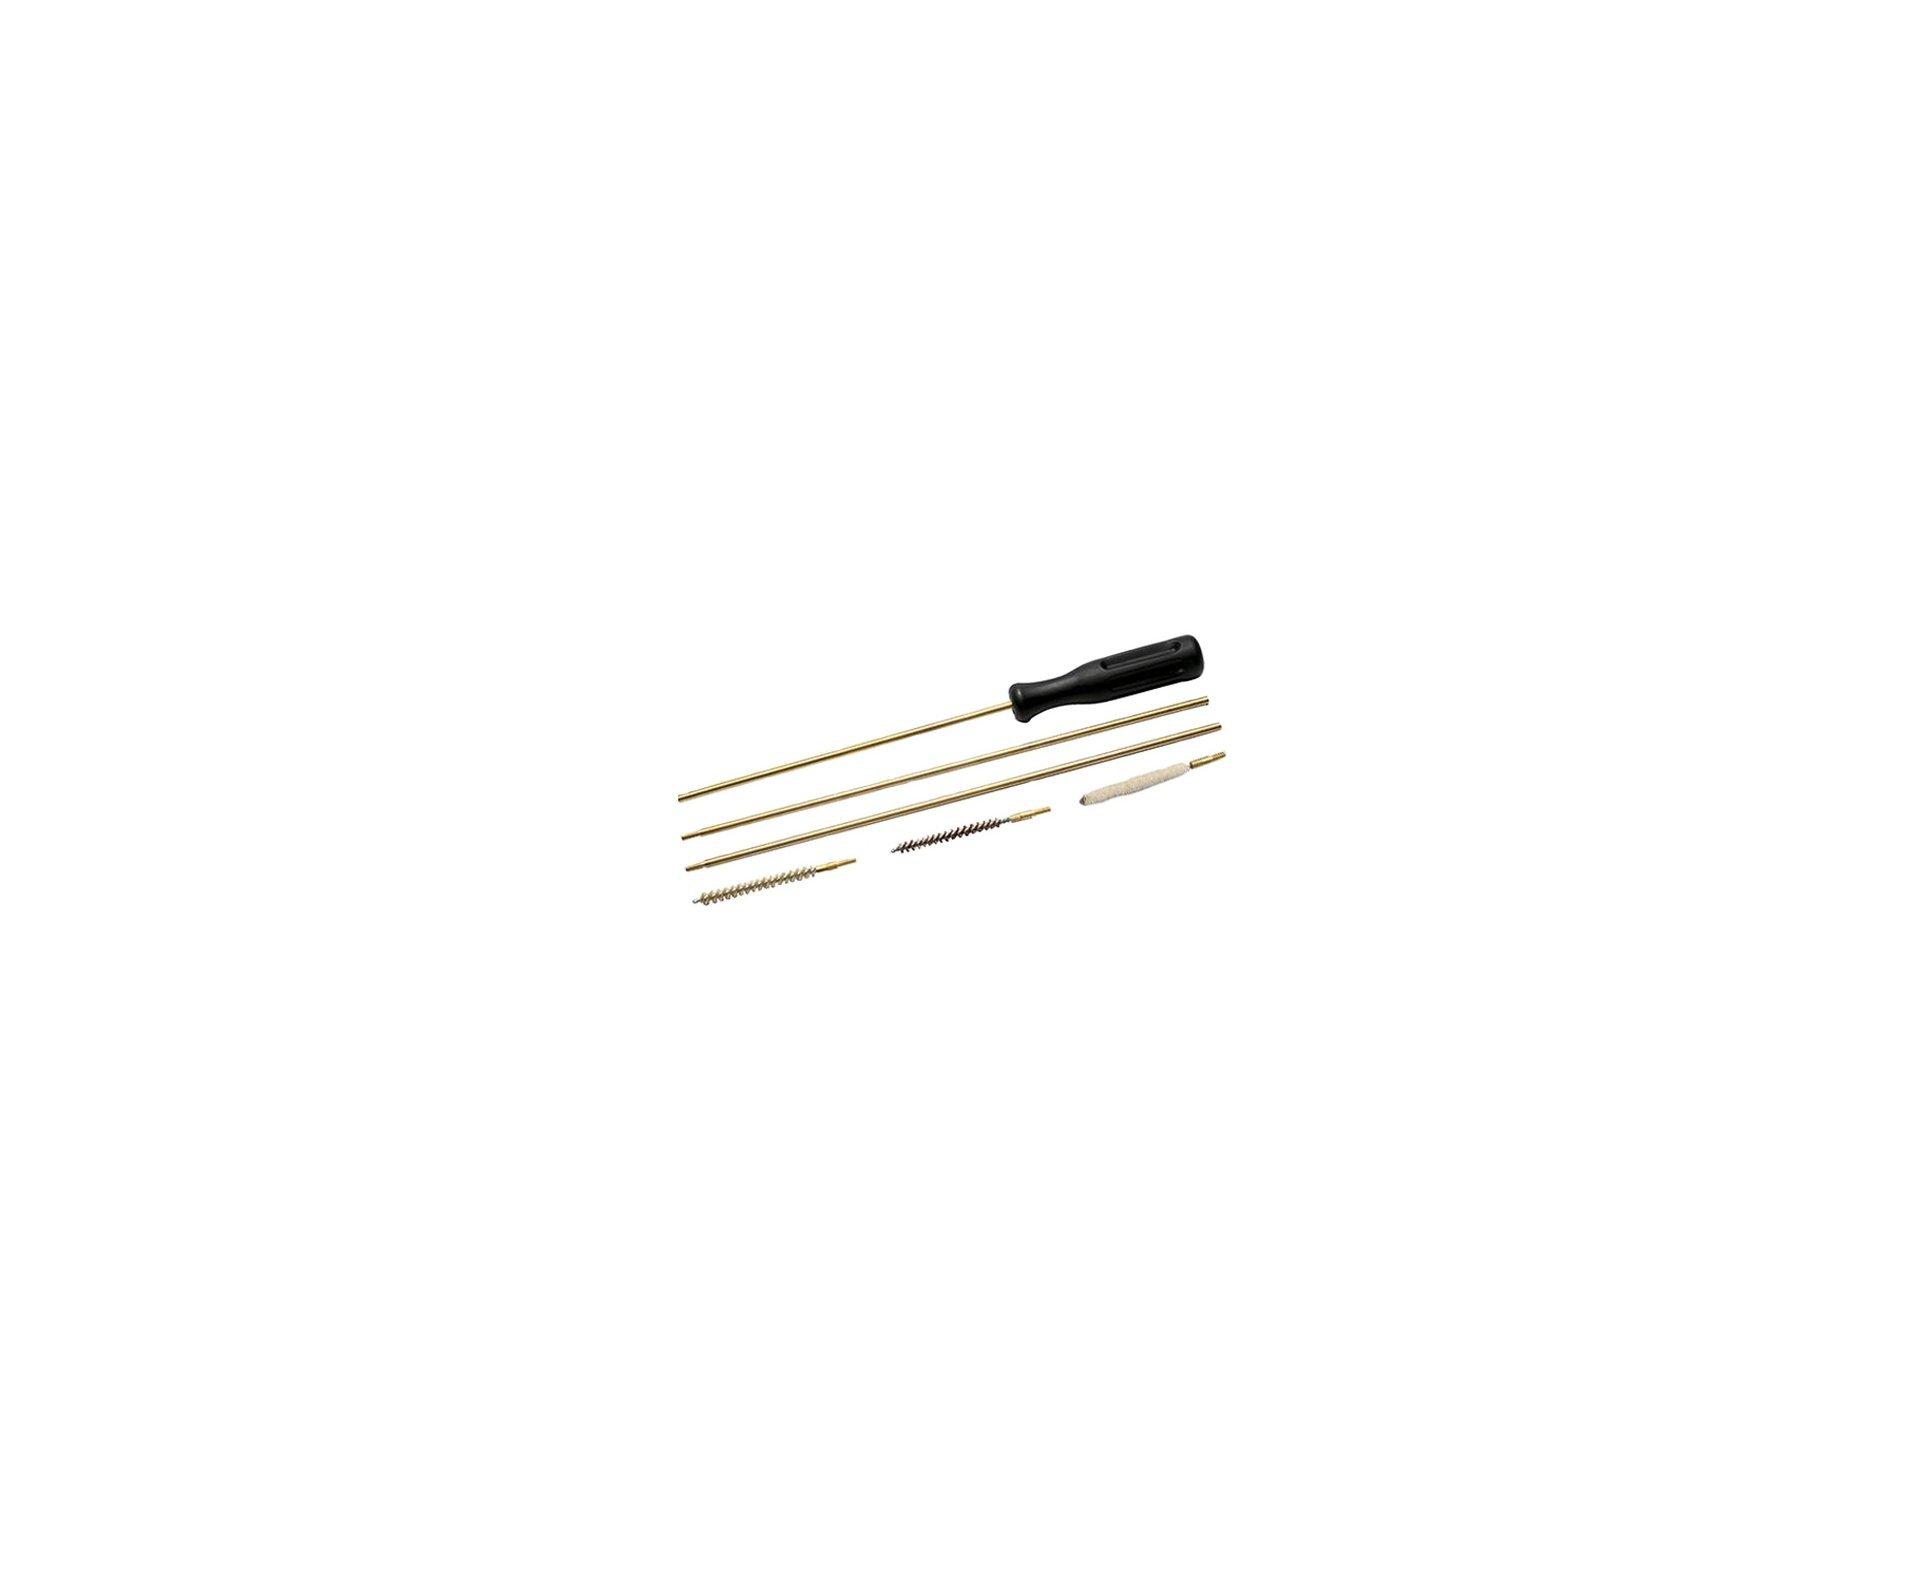 "Carabina De Pressão Hatsan Ht 95 5,5mm Com Pistão Pneumático + Canivete + Kit Limpeza + Chumbinhos + Capa 46"" - Hatsan"